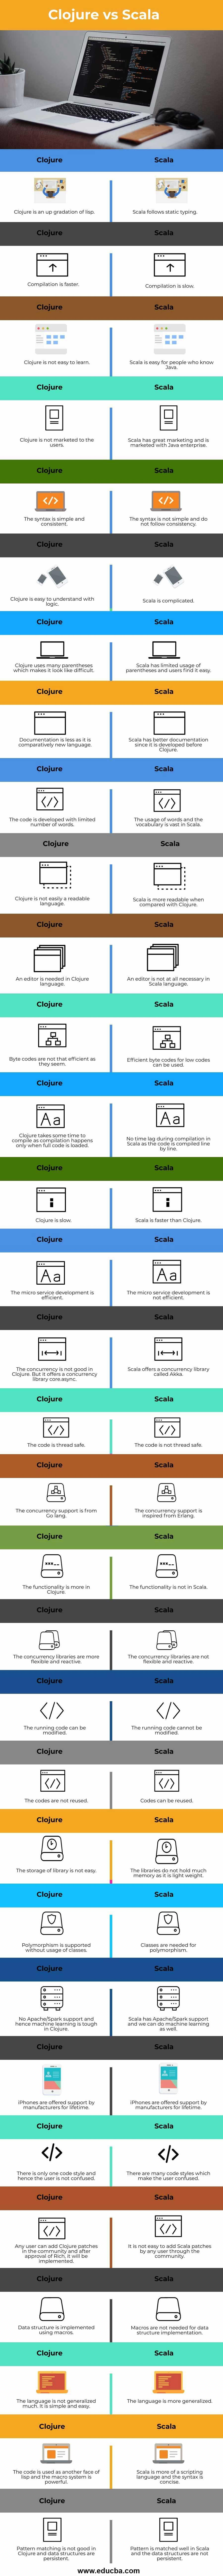 Clojure-vs-Scala-info